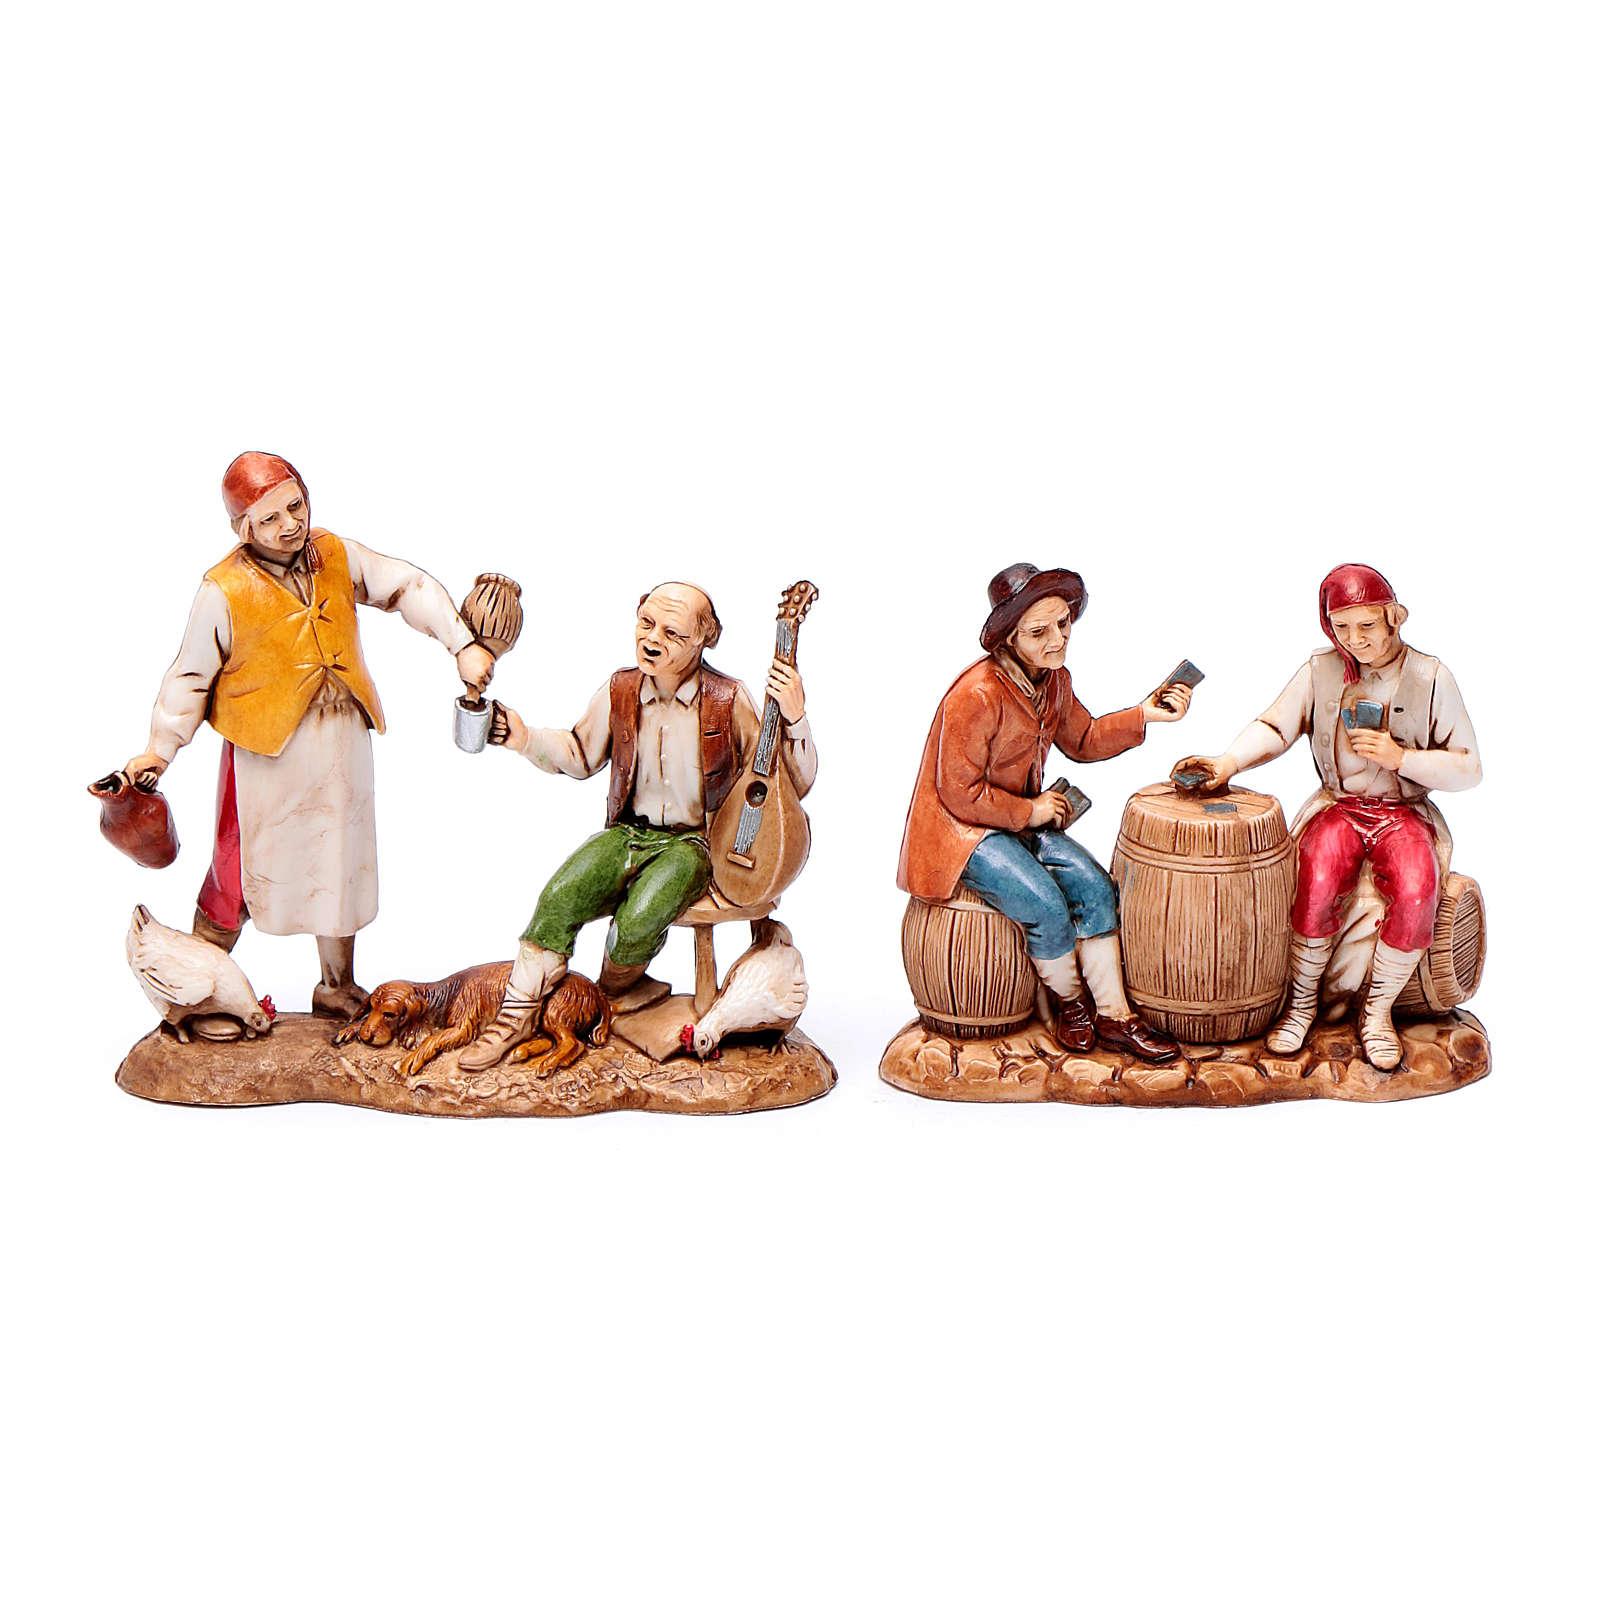 Nativity Scene figurines 8cm, restaurant 3 pcs 4